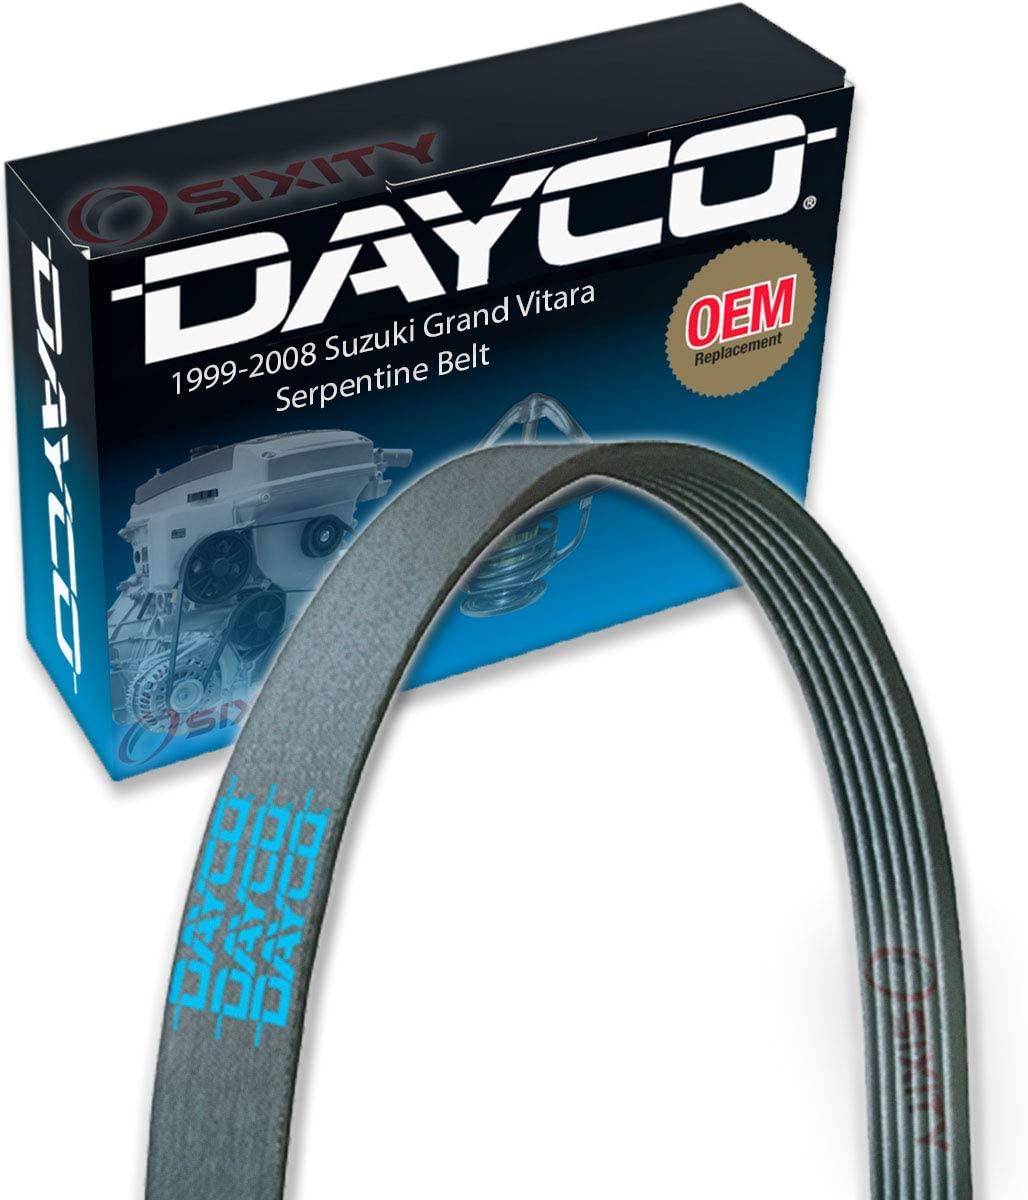 Dayco Serpentine Belt for 1999-2008 Suzuki Grand Vitara 2.7L V6 - V Belt Ribbed Accessory Drive